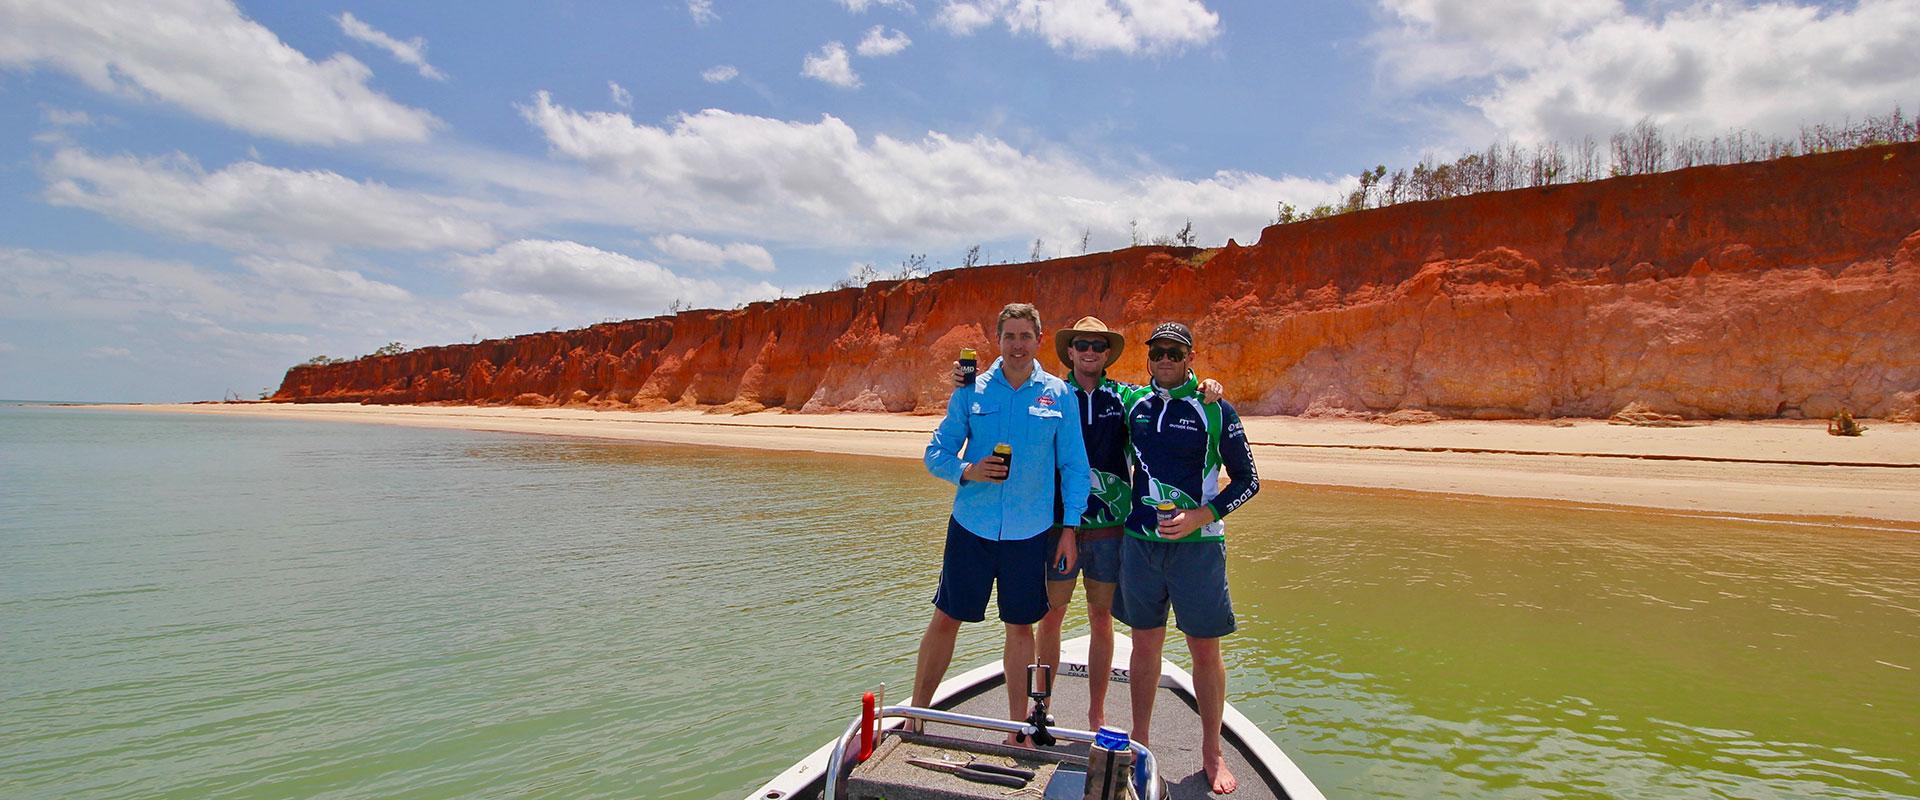 WEIPA FISHING CHARTERS <span>FIVE DAY TRIPS</span>